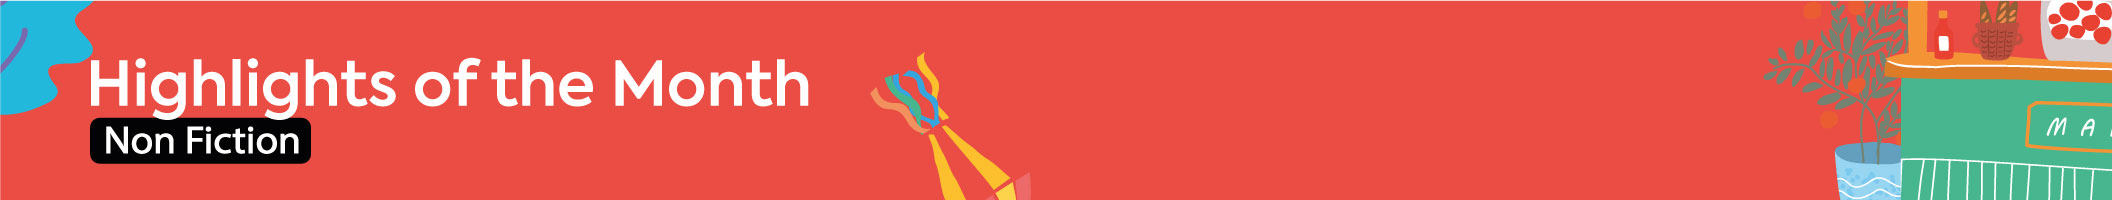 NFHOTM Landing page banner 2112x200